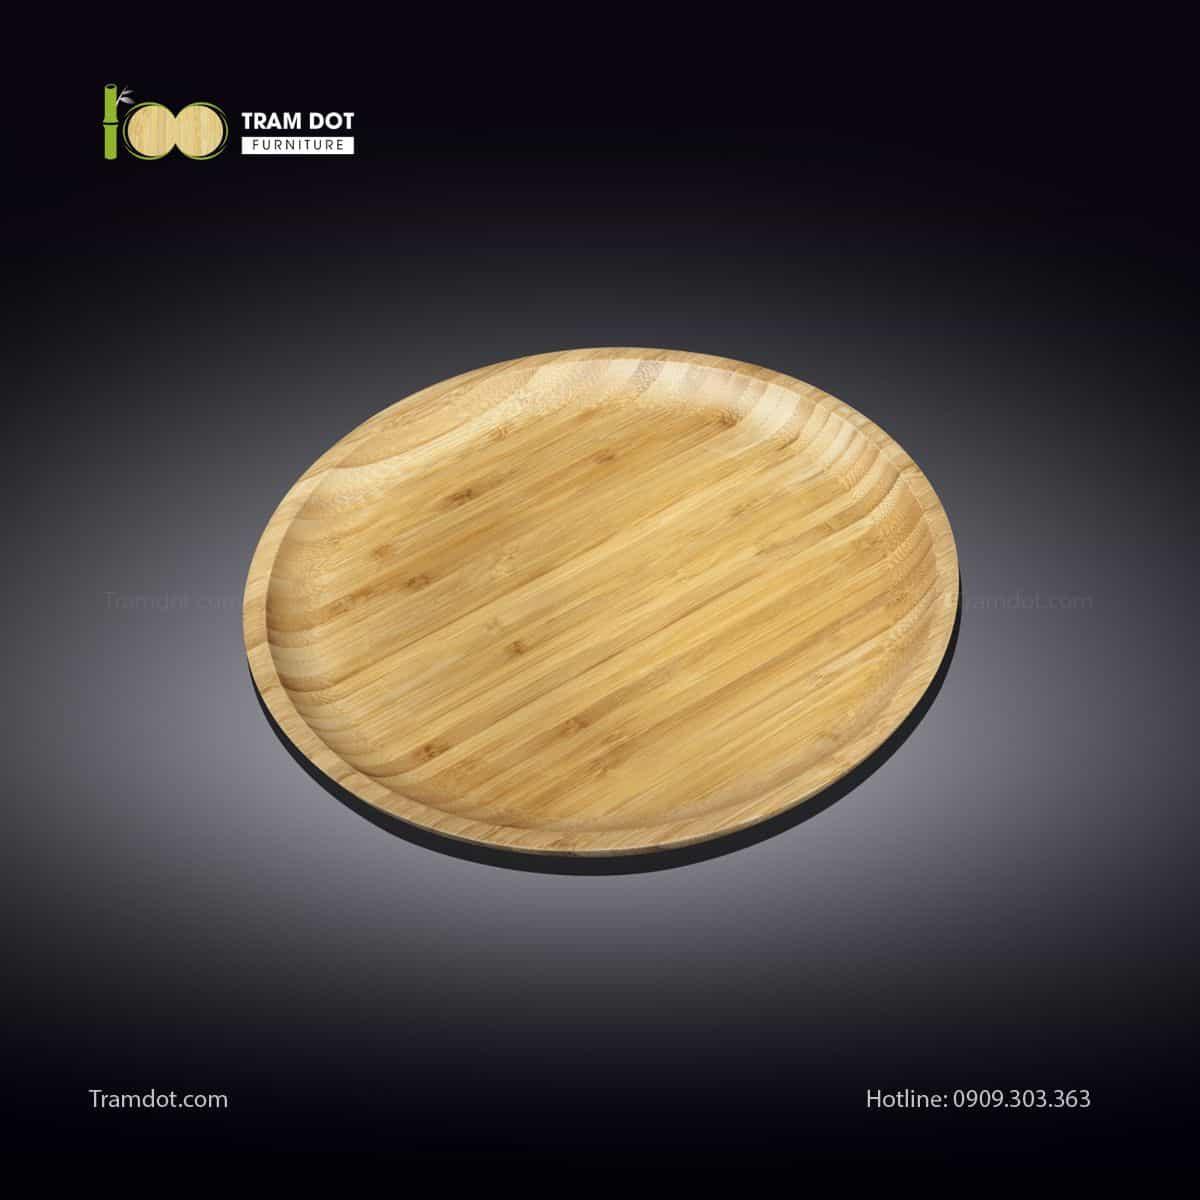 Đĩa tre tròn 20.5×20.5cm (HỘP 30 CÁI) | TRAMDOT Furniture